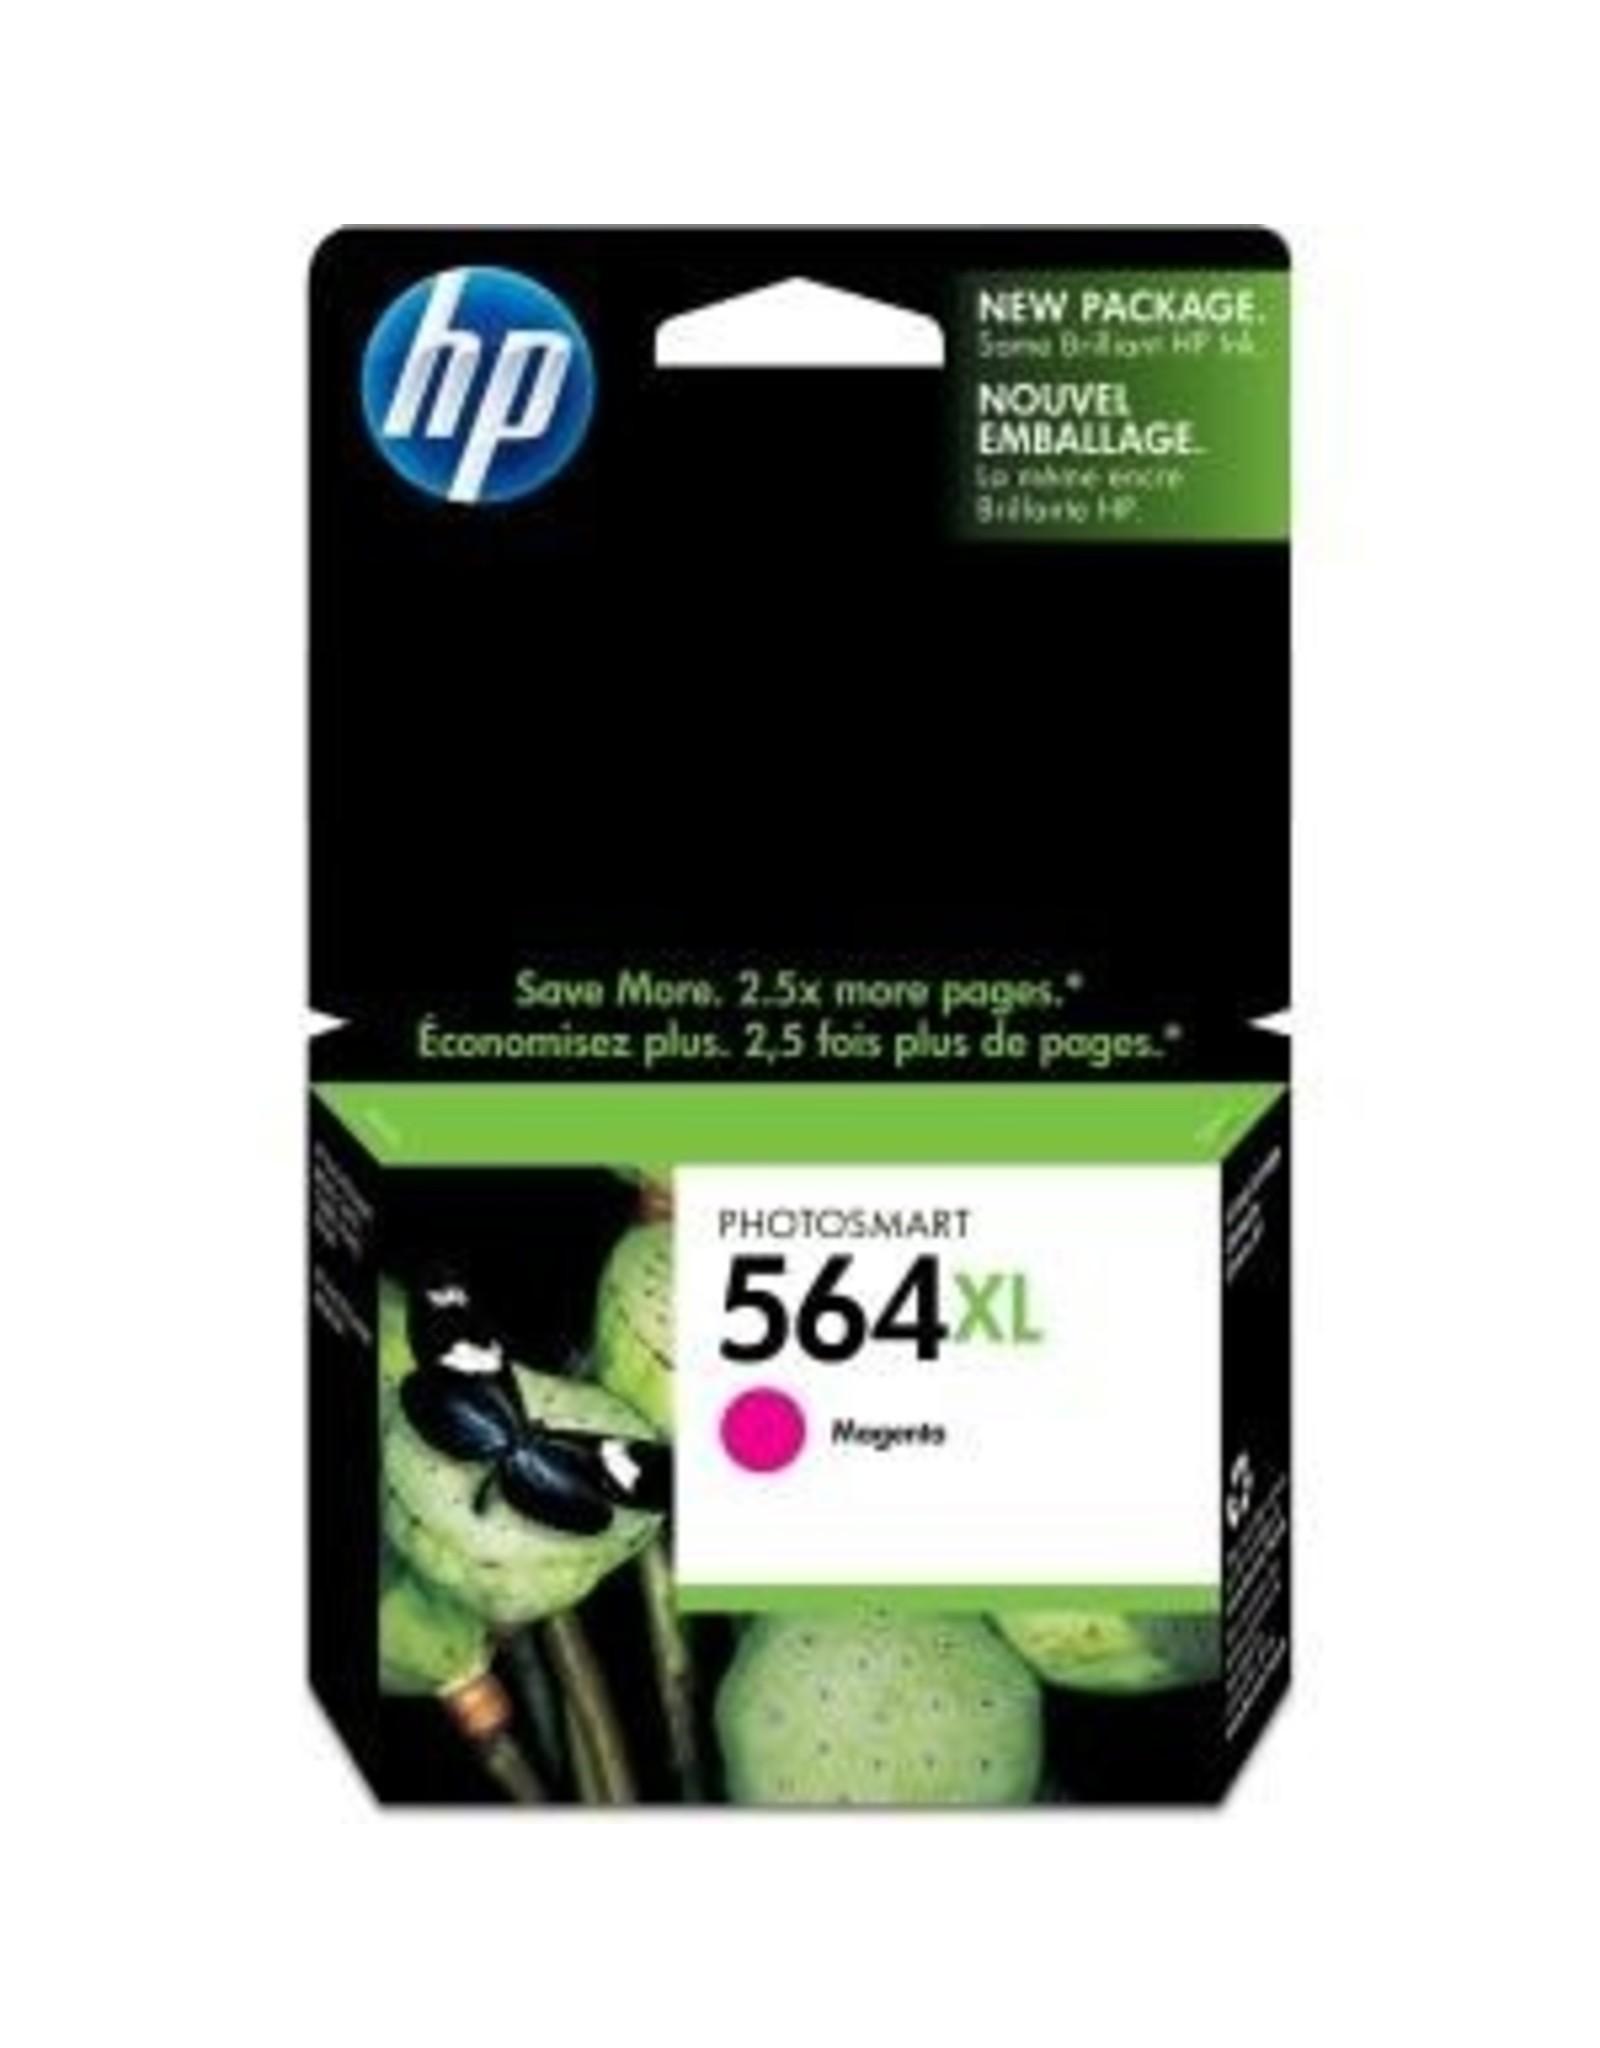 HP INKJET CARTRIDGE-HP #564XL MAGENTA HIGH YIELD